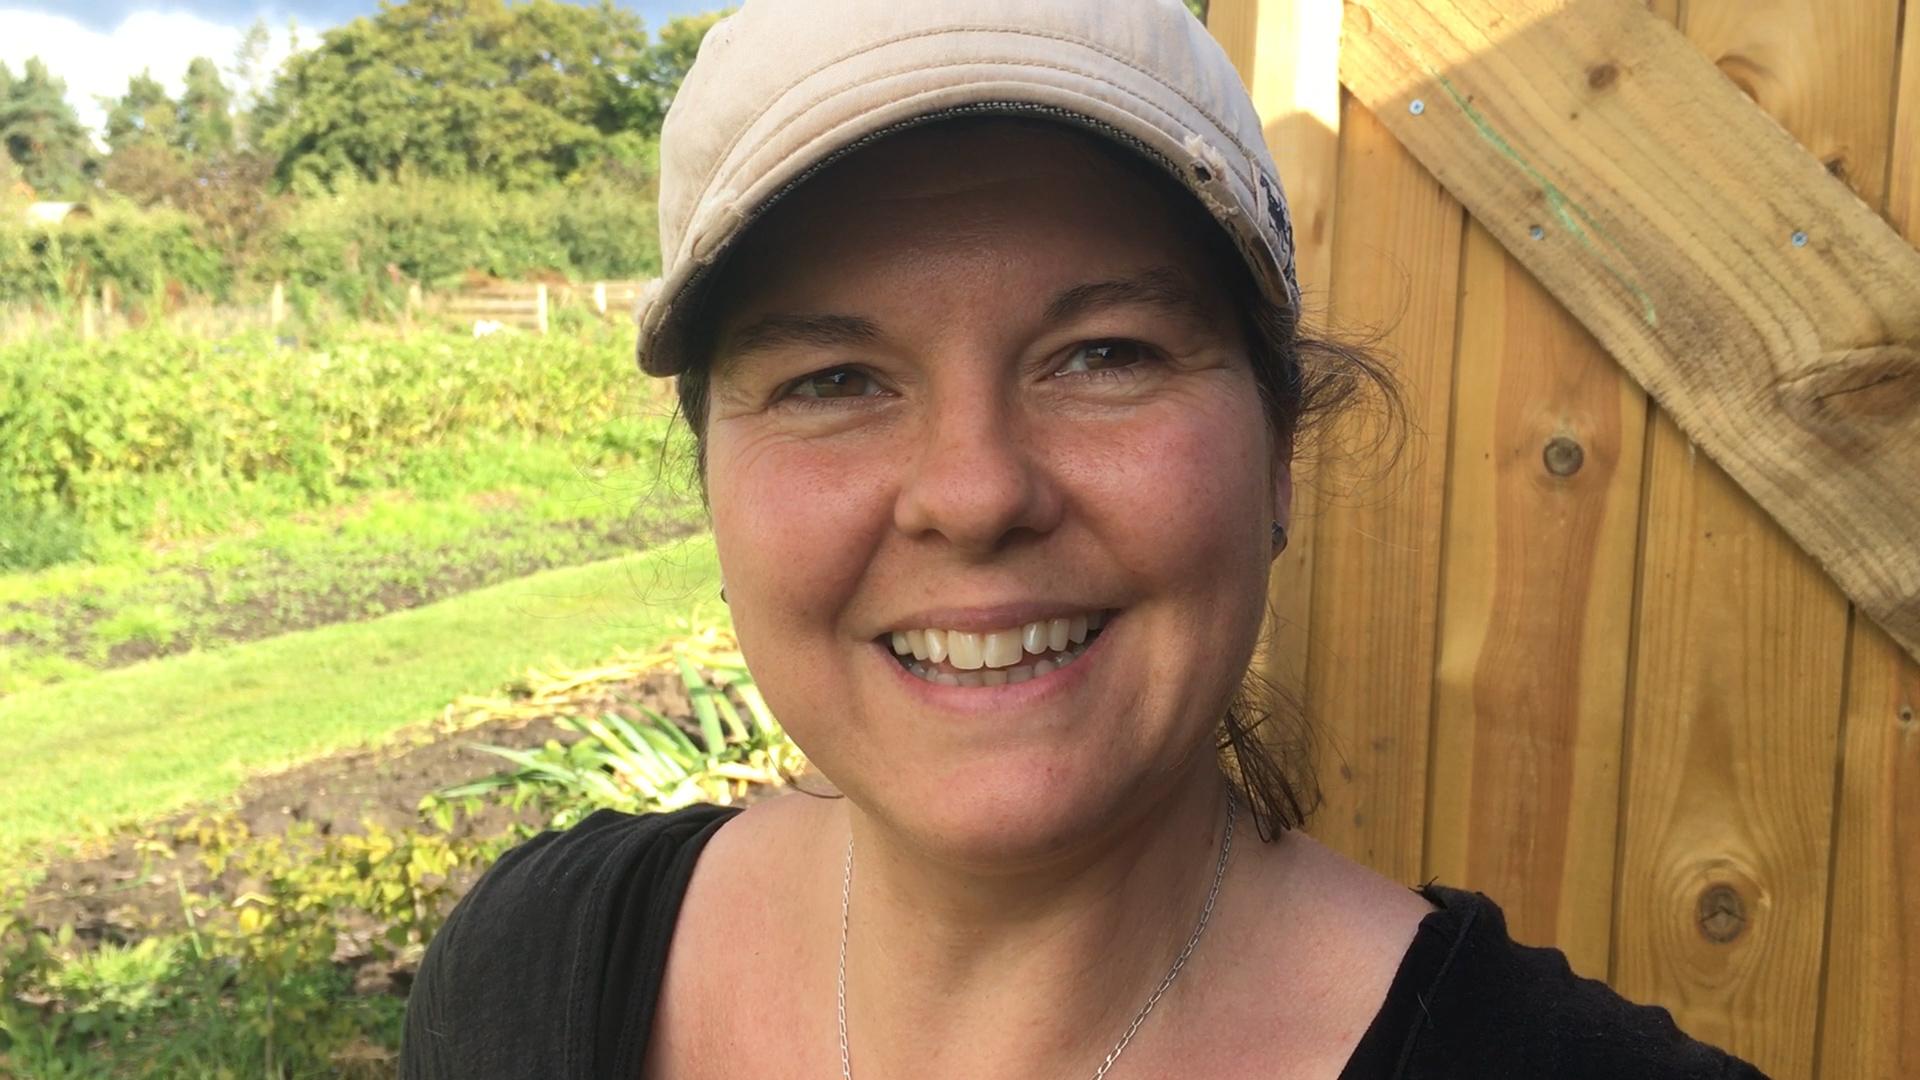 Jane Pryde founded Higher Ground Allendale